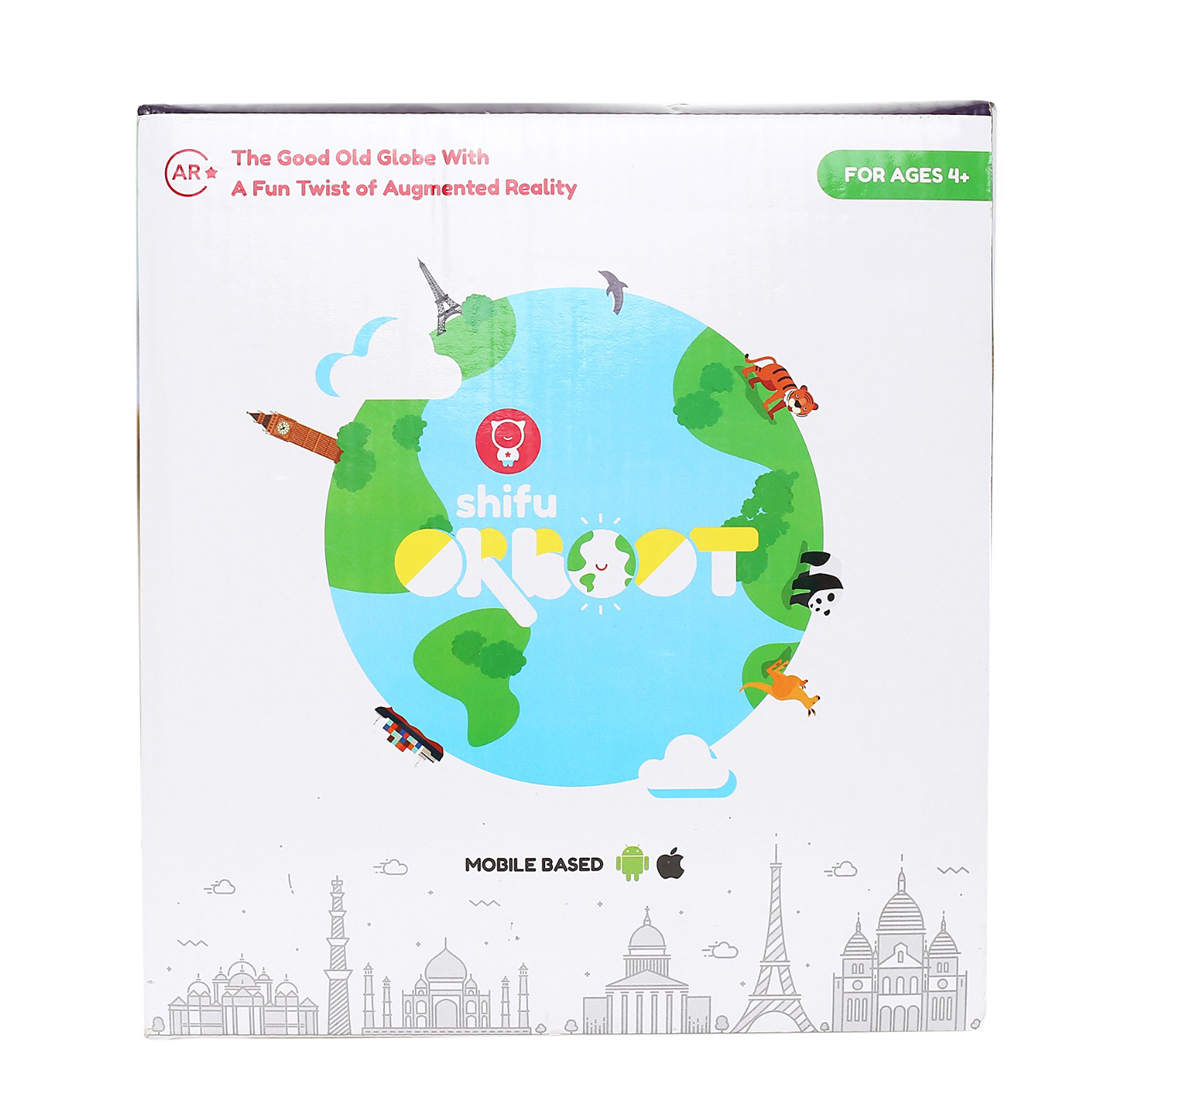 Playshifu | Playshifu Orboot - The Educational, Augmented Reality Based Globe Science Equipments for Kids age 4Y+